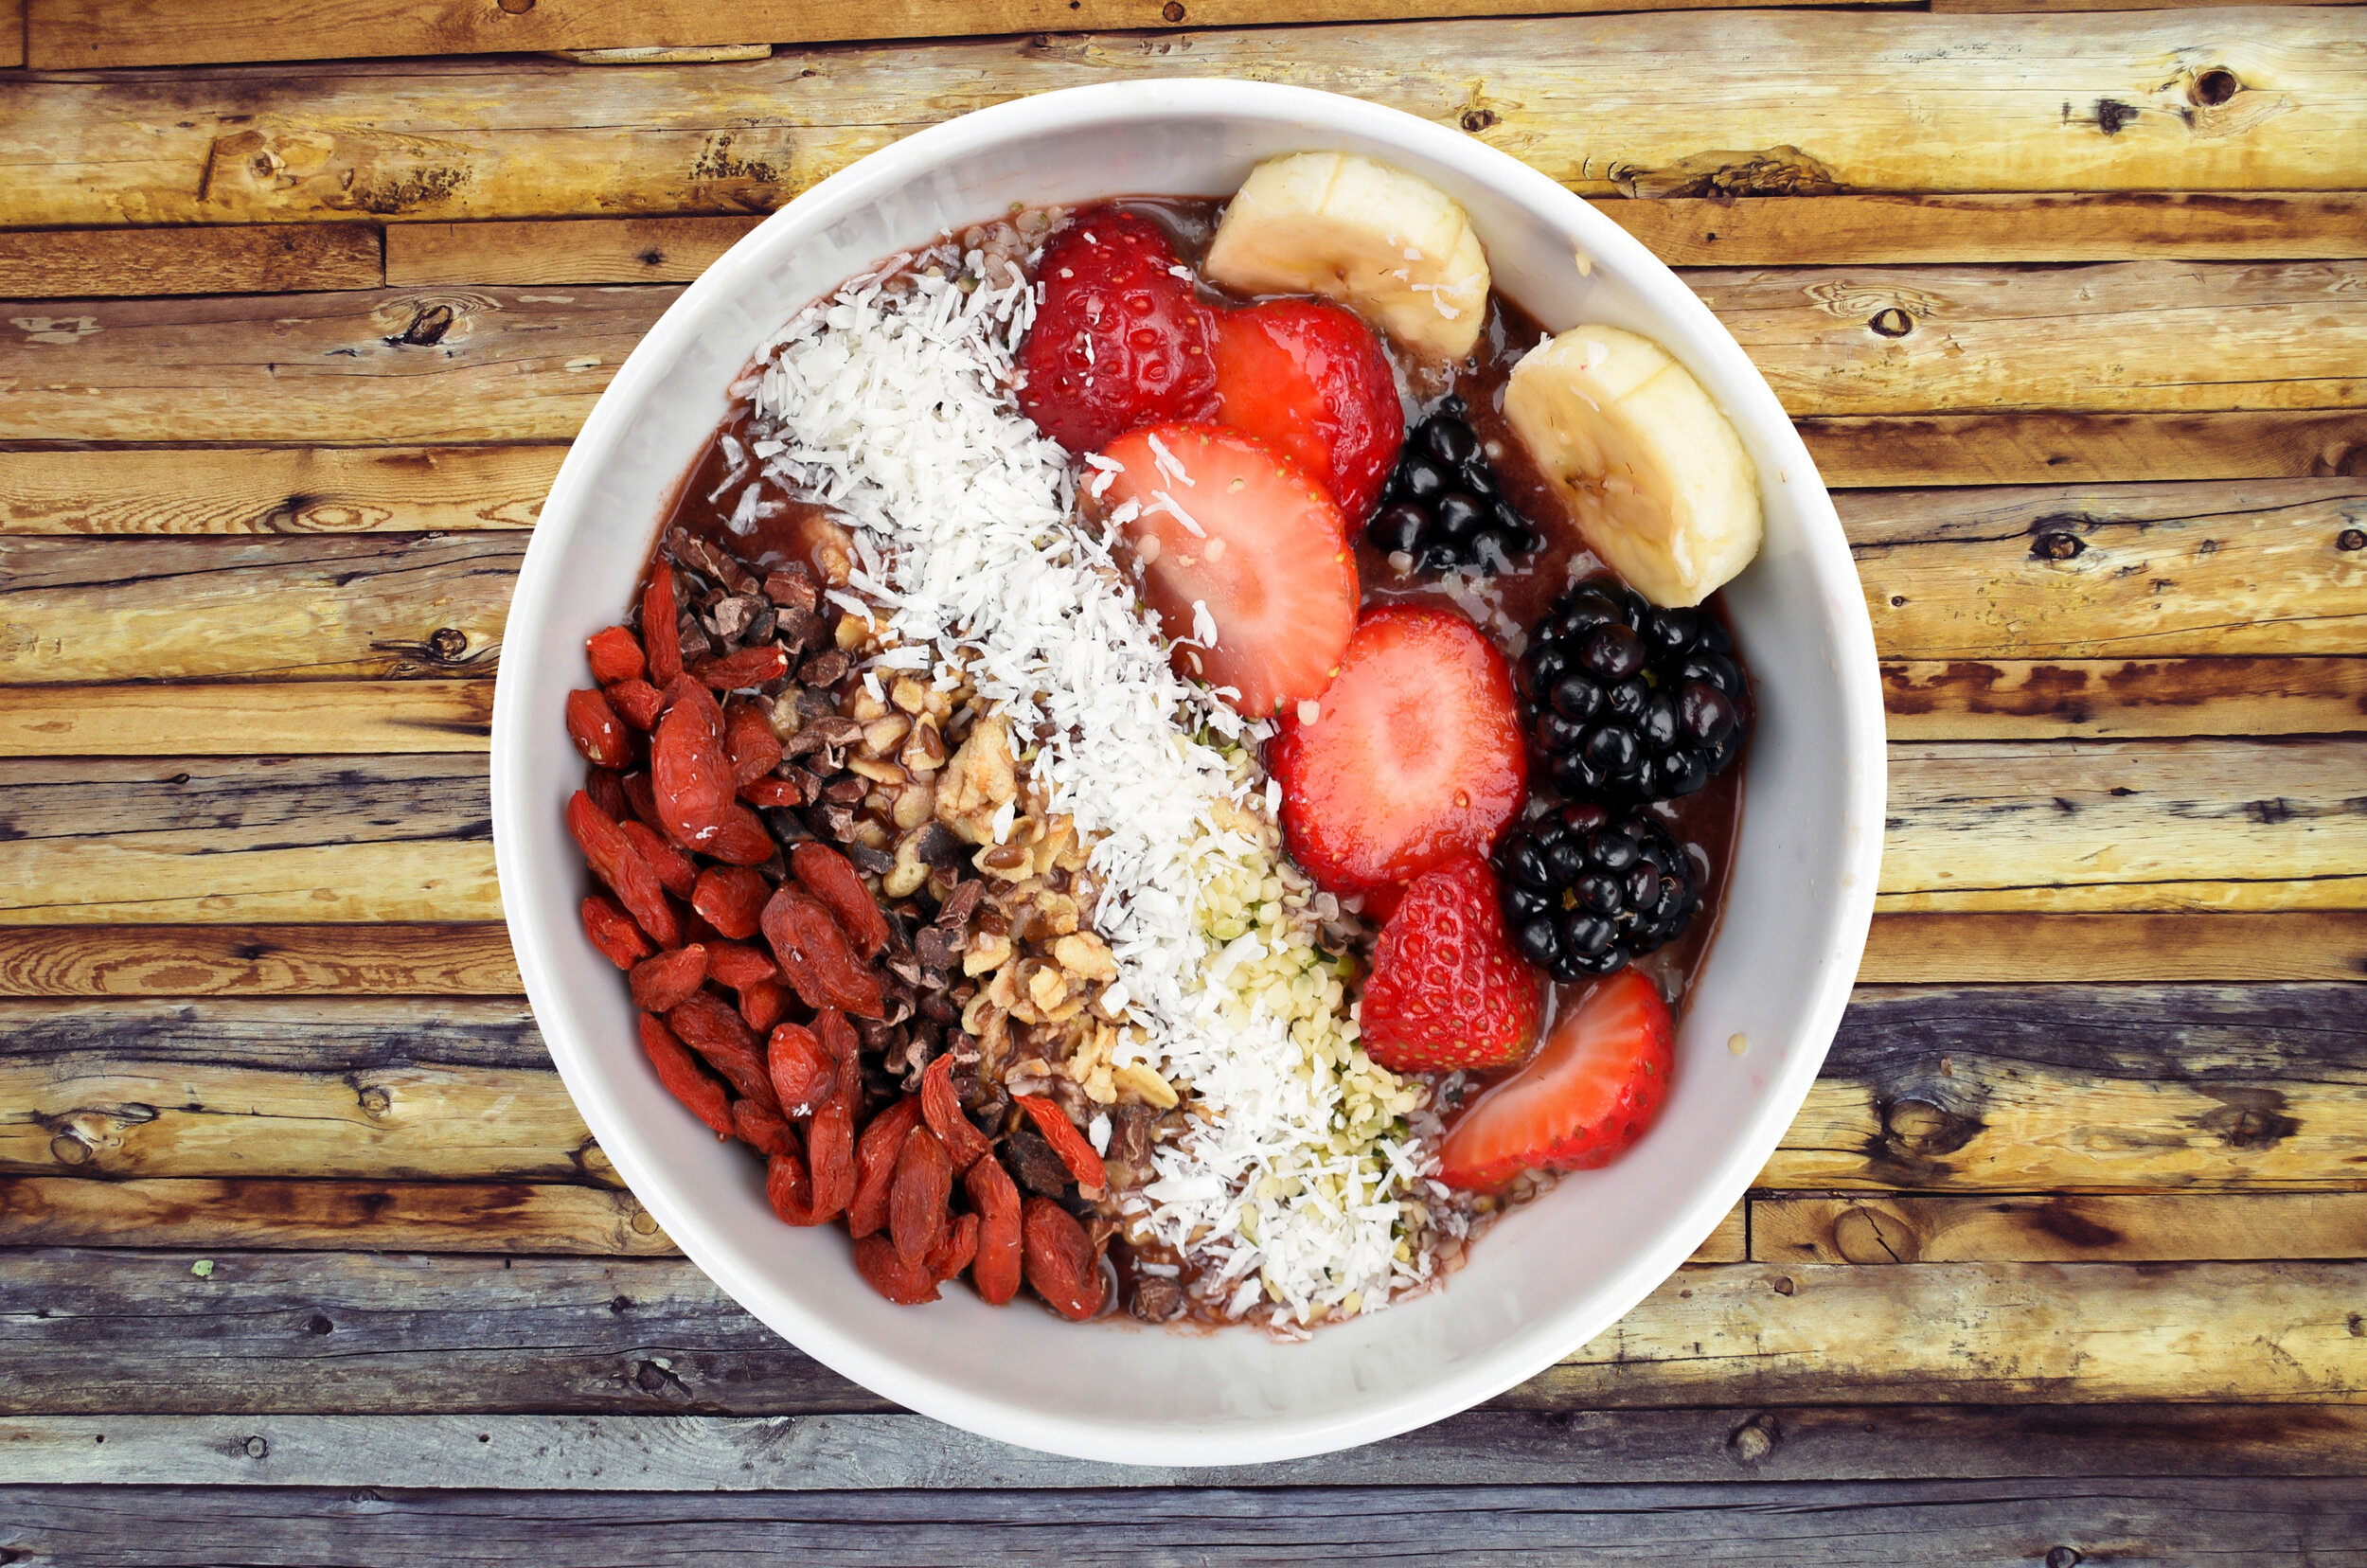 Canva - Bowl Of Fruit, Breakfast, Food, Organic, Bowl, Diet.jpg